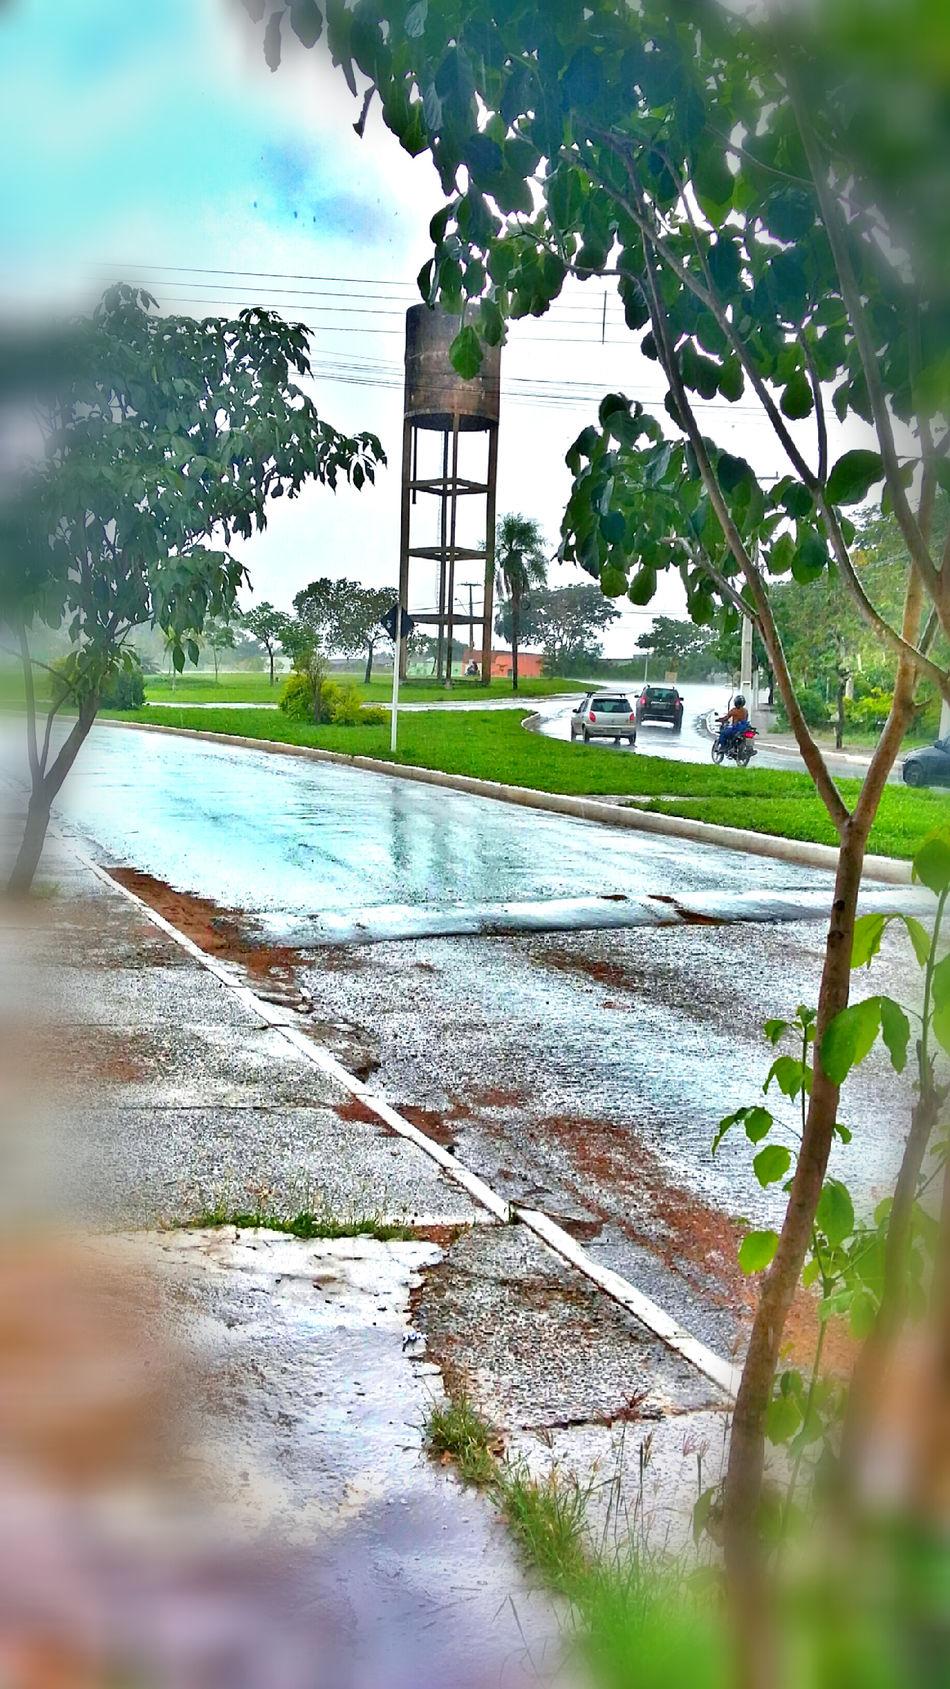 DeOntem! Chuva